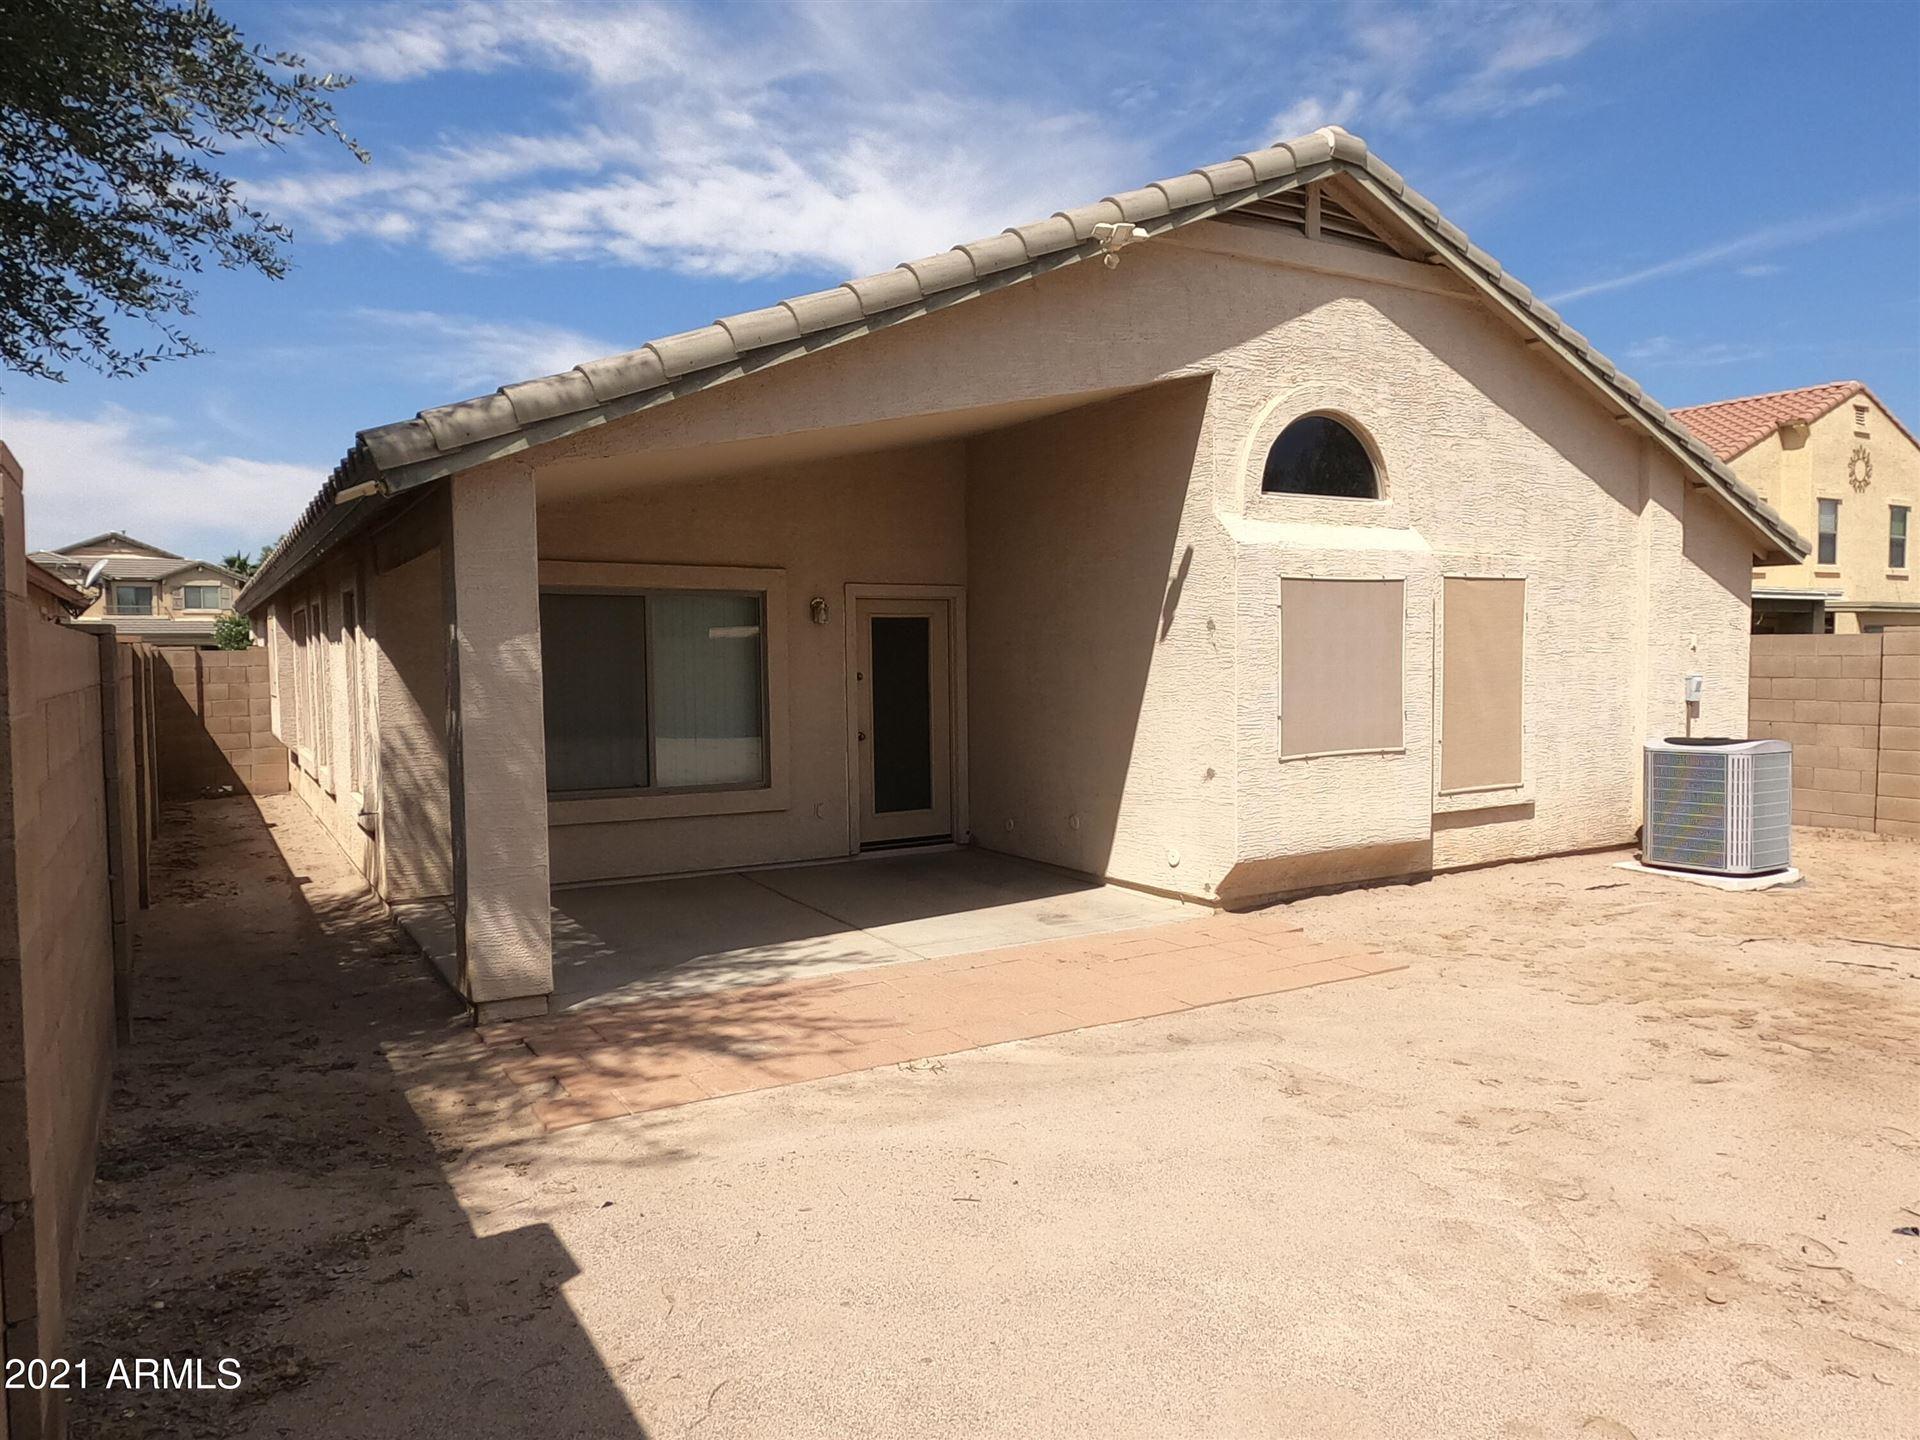 Photo of 34361 N CHANNI Trail, San Tan Valley, AZ 85143 (MLS # 6291957)